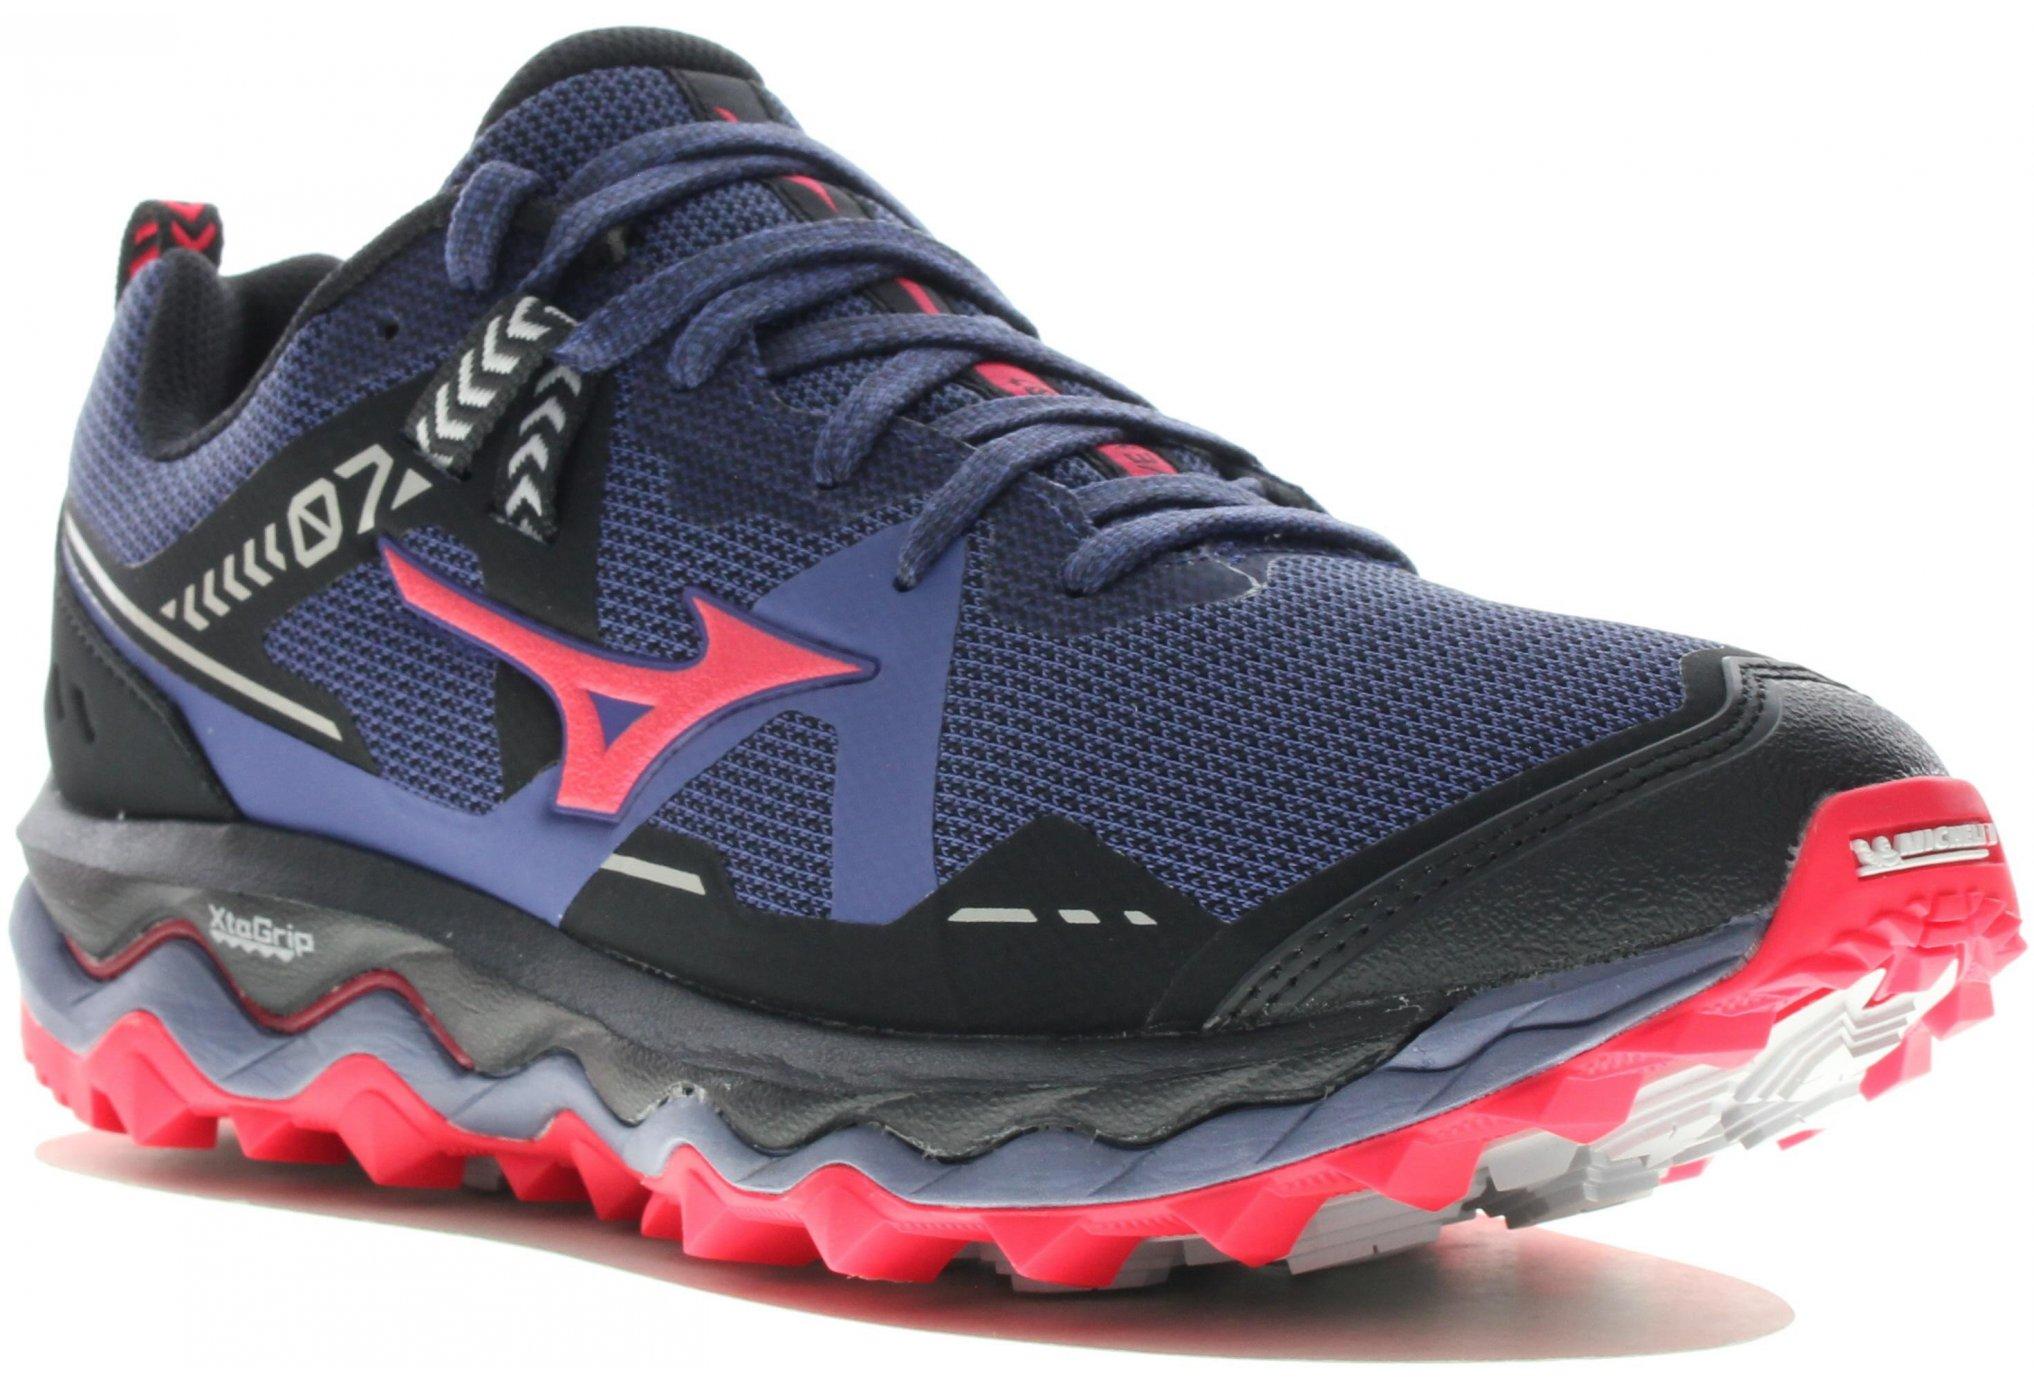 Mizuno Wave Mujin 7 Chaussures running femme